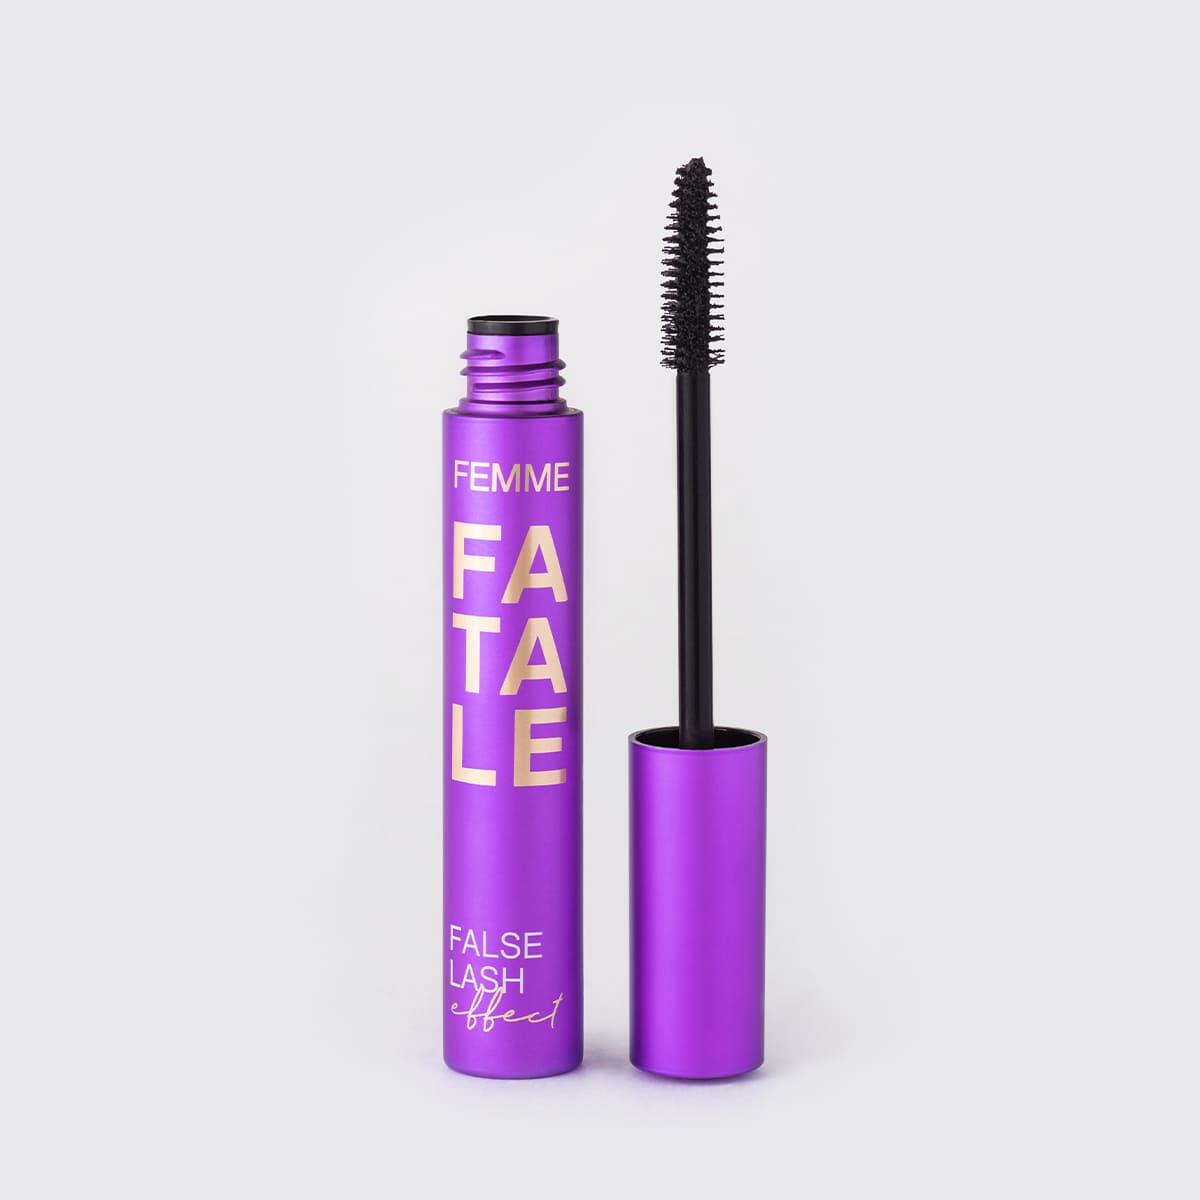 Vivienne Sabo - False Lash Effect Mascara Femme Fatale, 9 ML